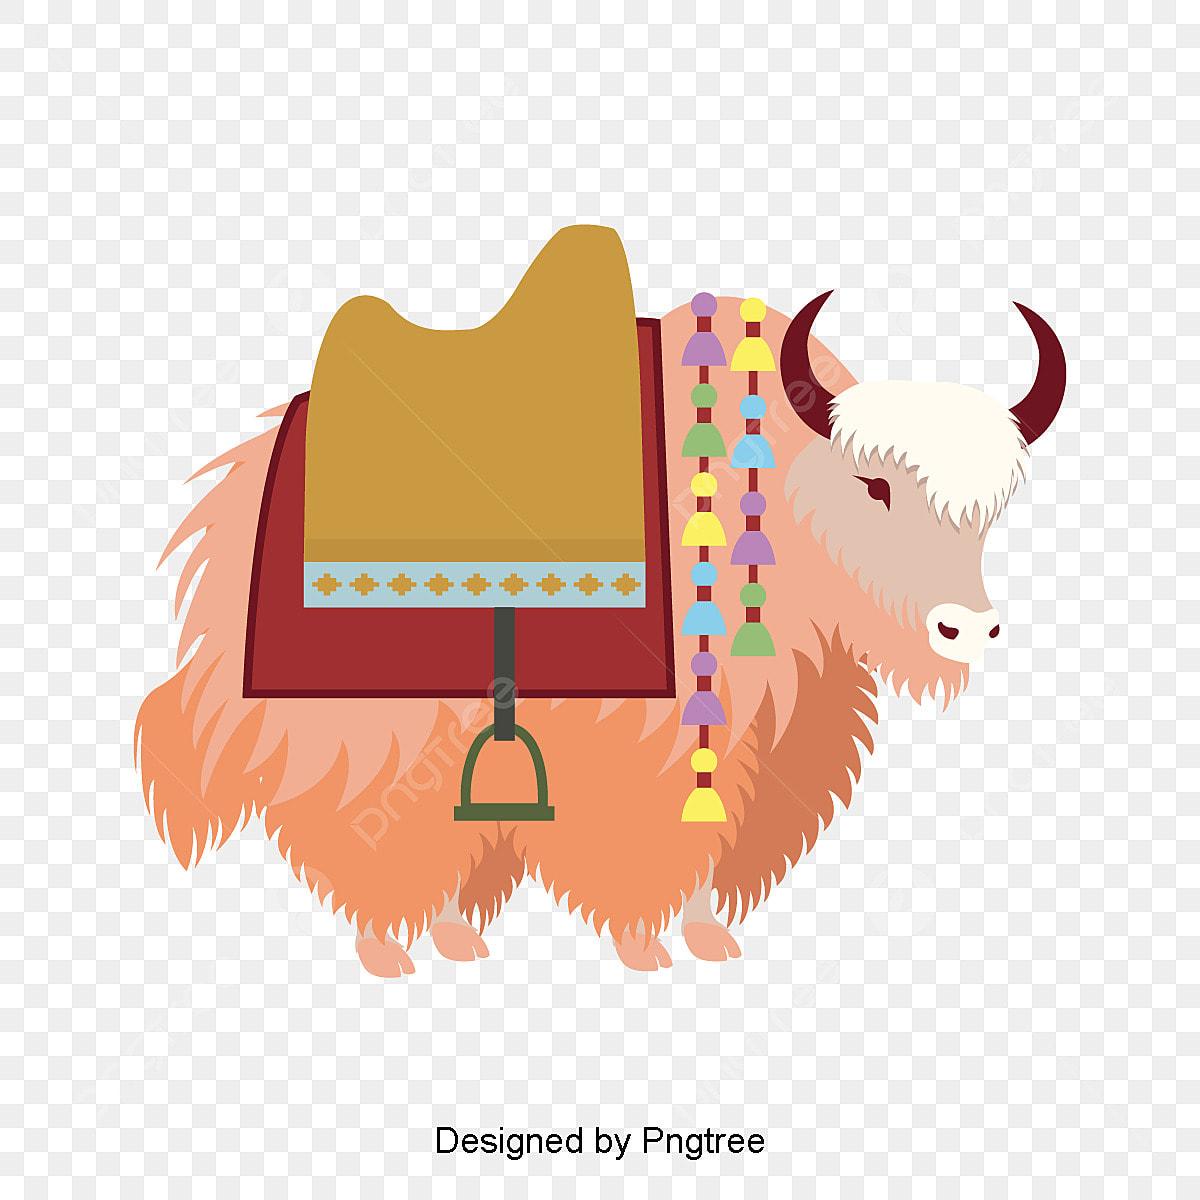 Clipart of a yak Cute cartoon yak drawing stock vector illustration of  character | Dorian.anayelizavalacitycouncil.com